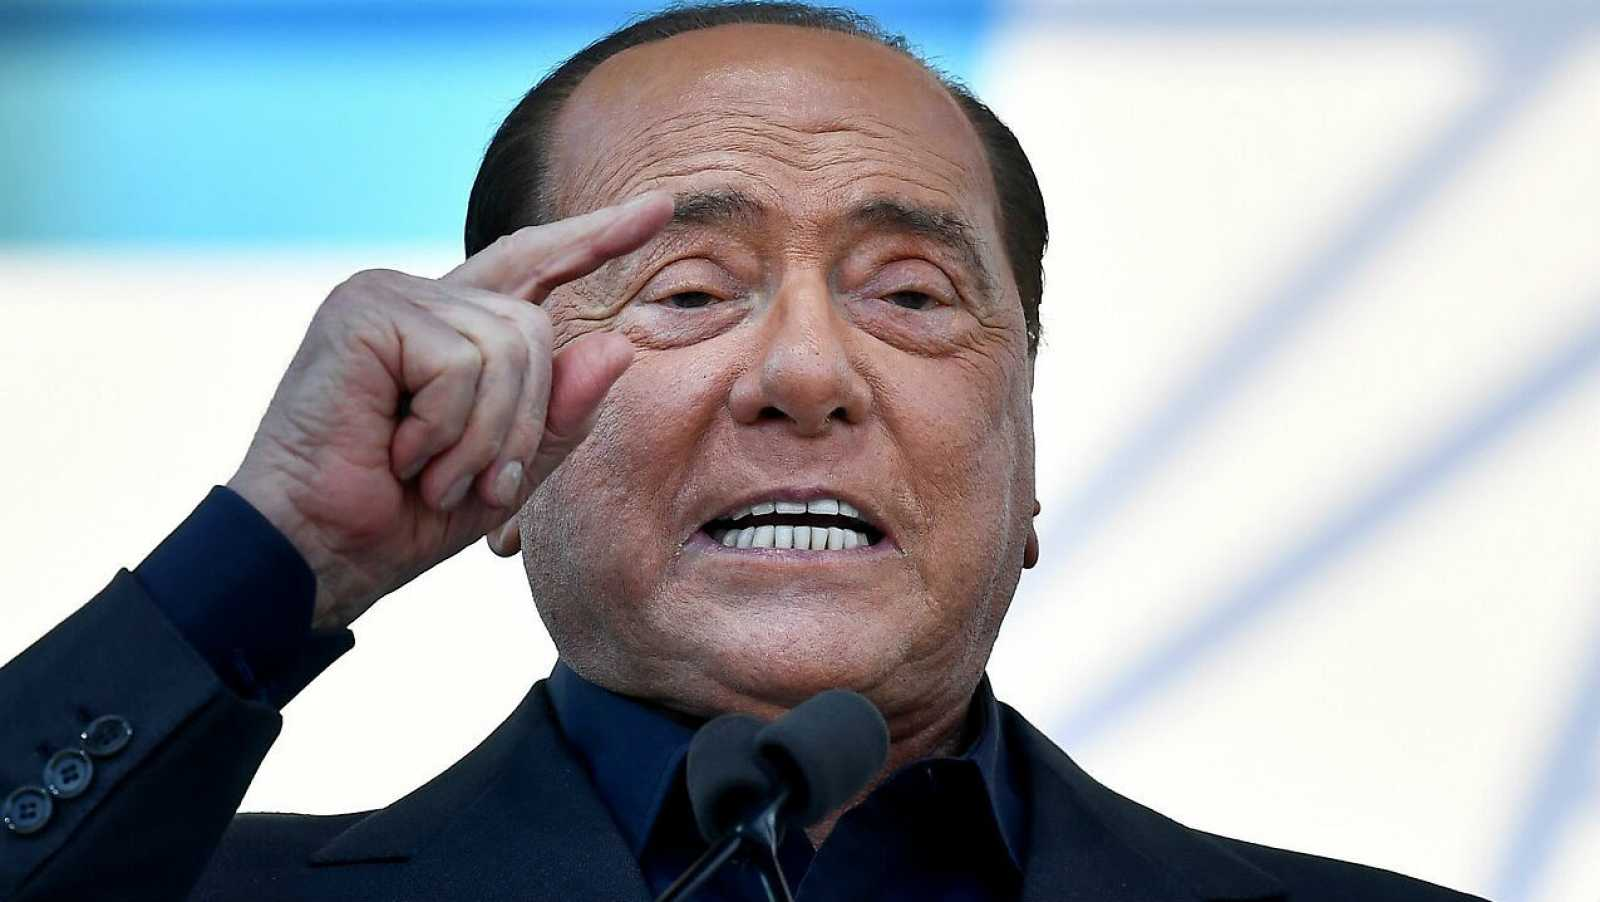 El líder del partido liberal-conservador italiano Forza Italia, Silvio Berlusconi, habla durante una conferencia en Roma, Italia.